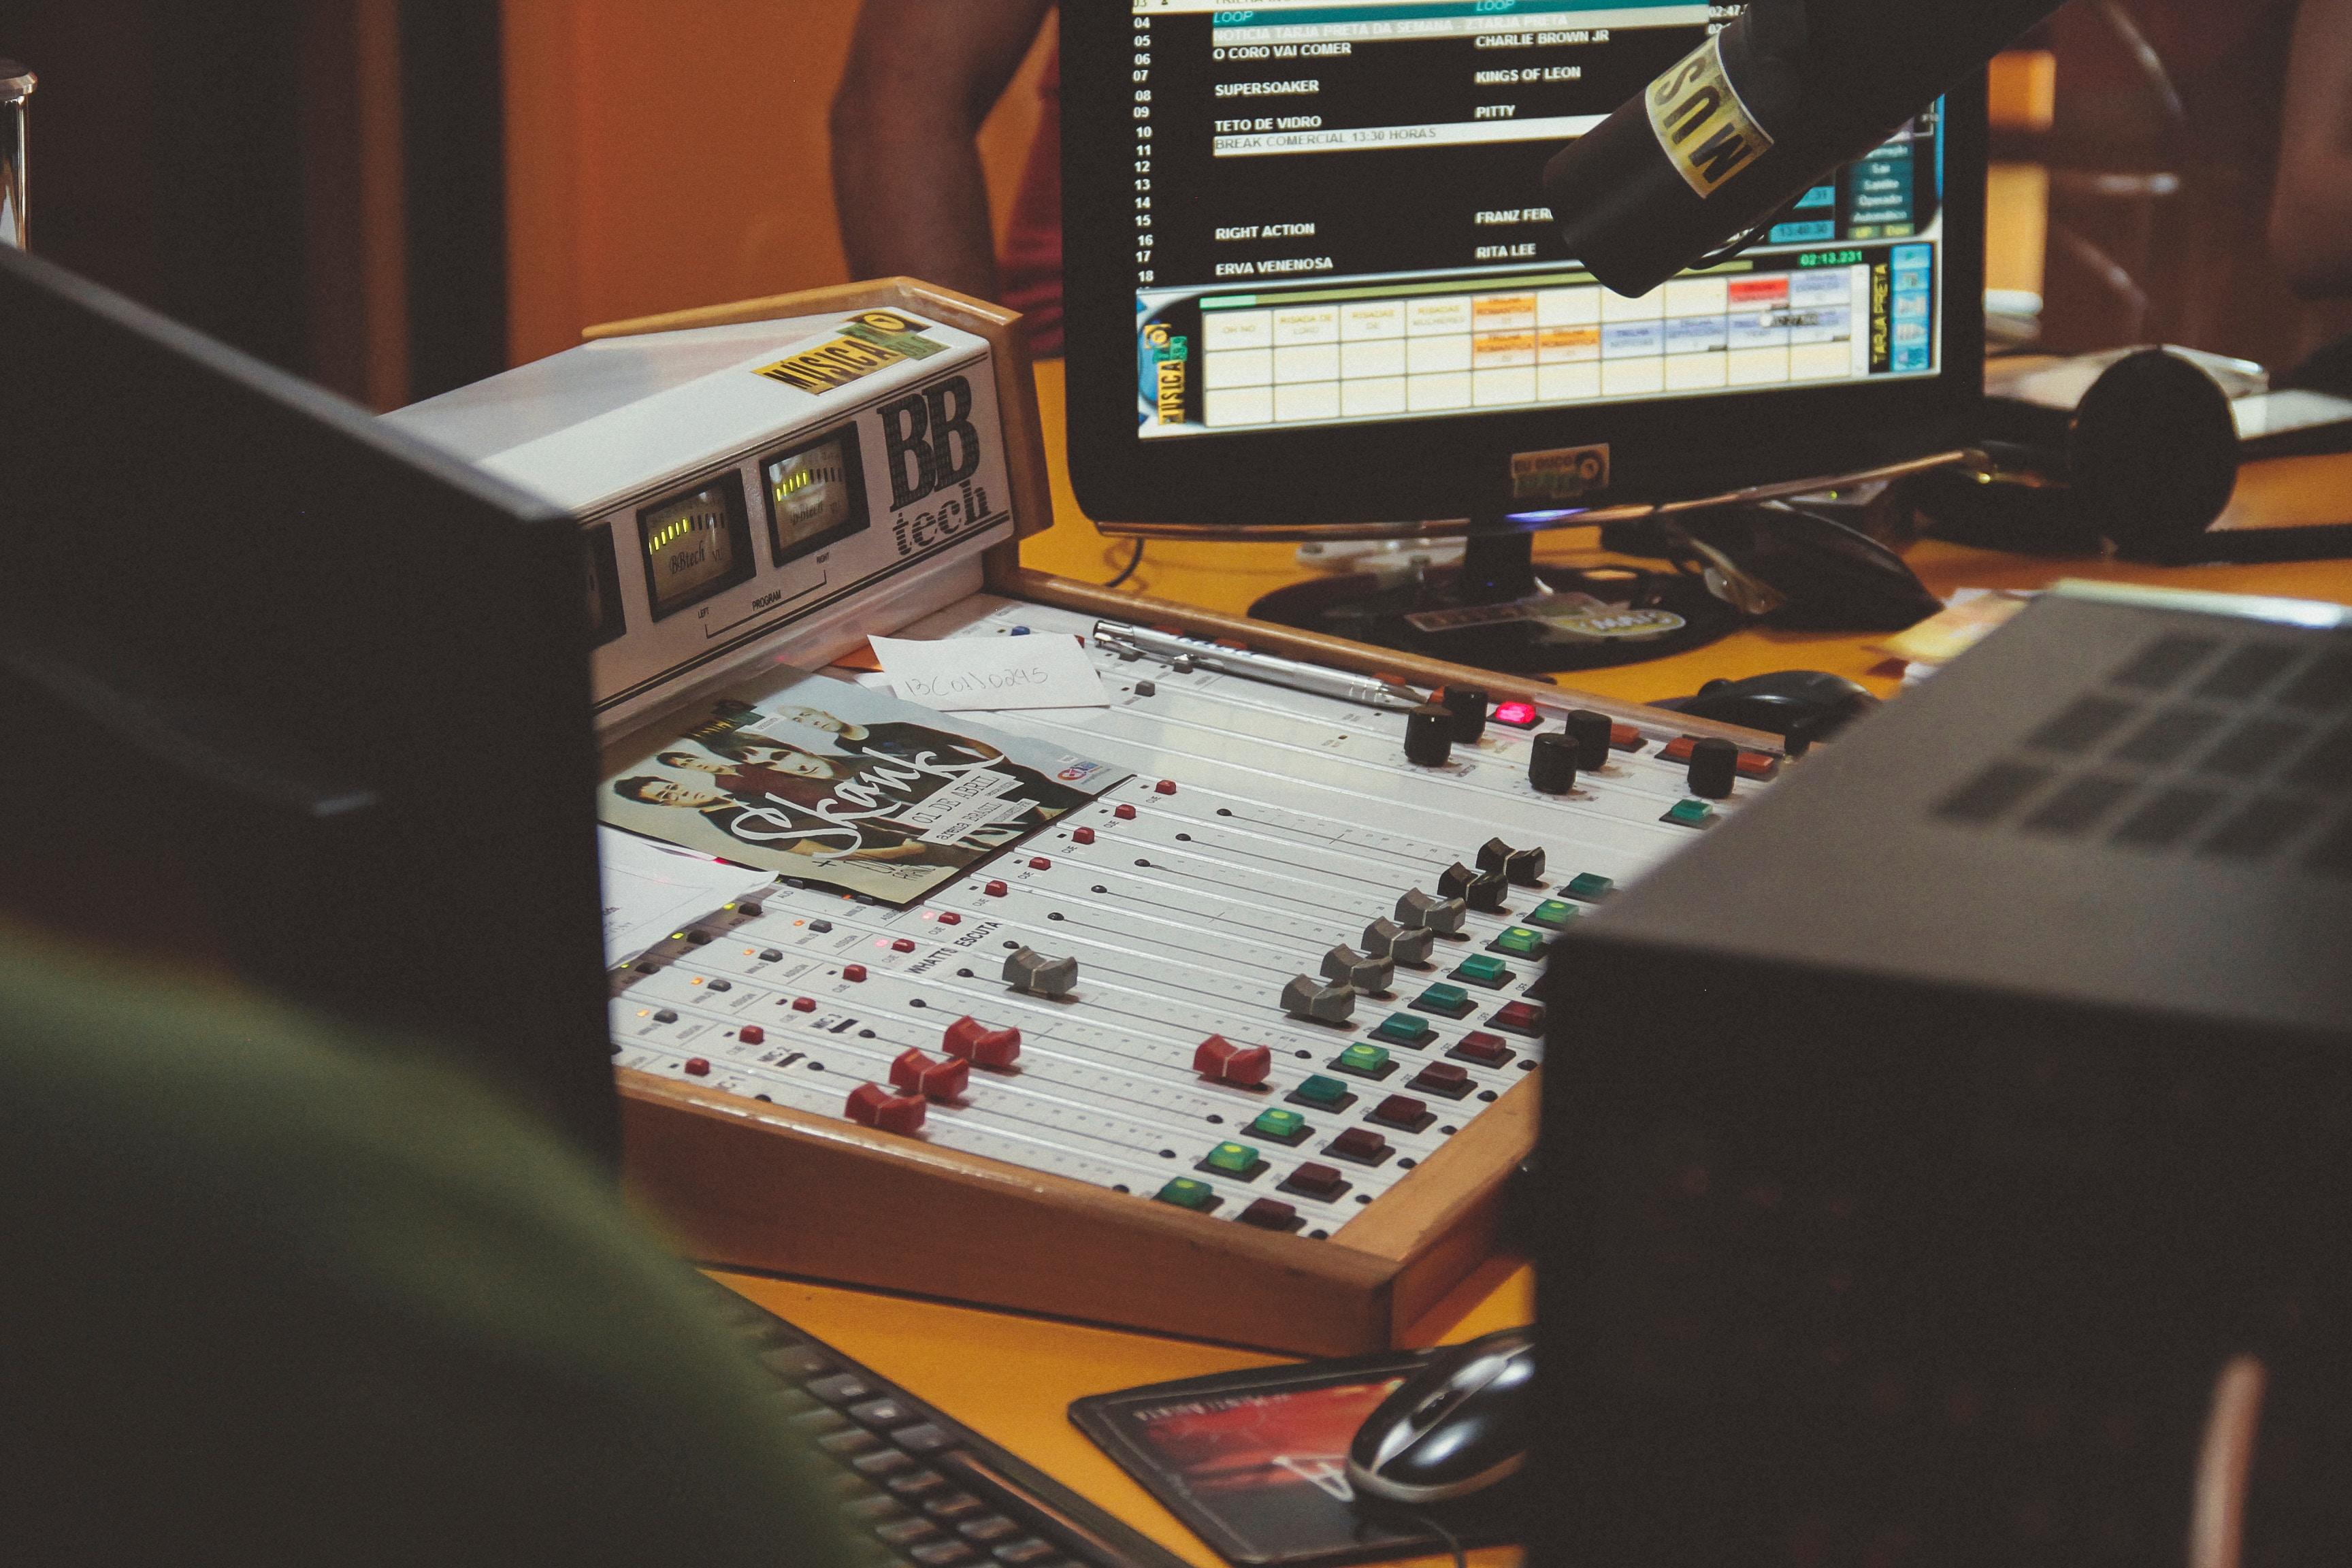 Častka piseń na radio ukraїnśkoju skladatyme 30%